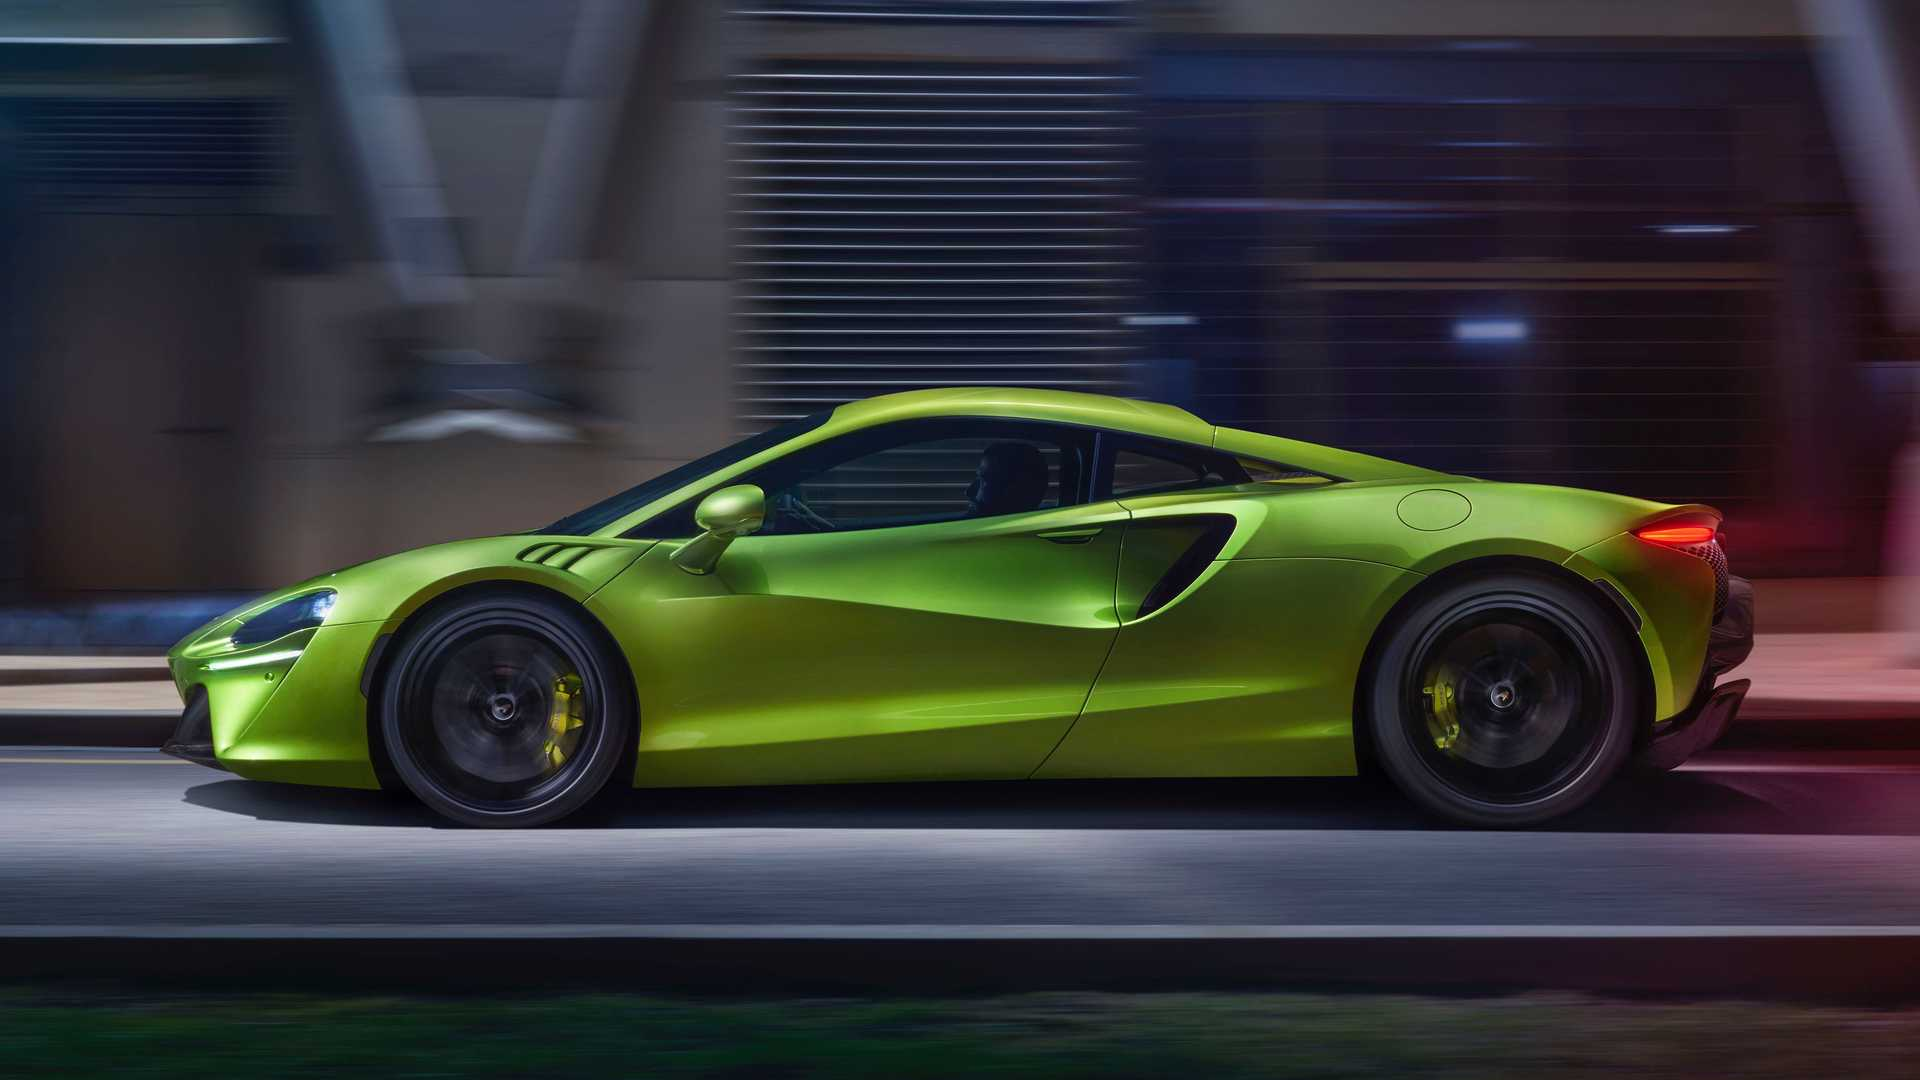 2022 McLaren Artura Exterior